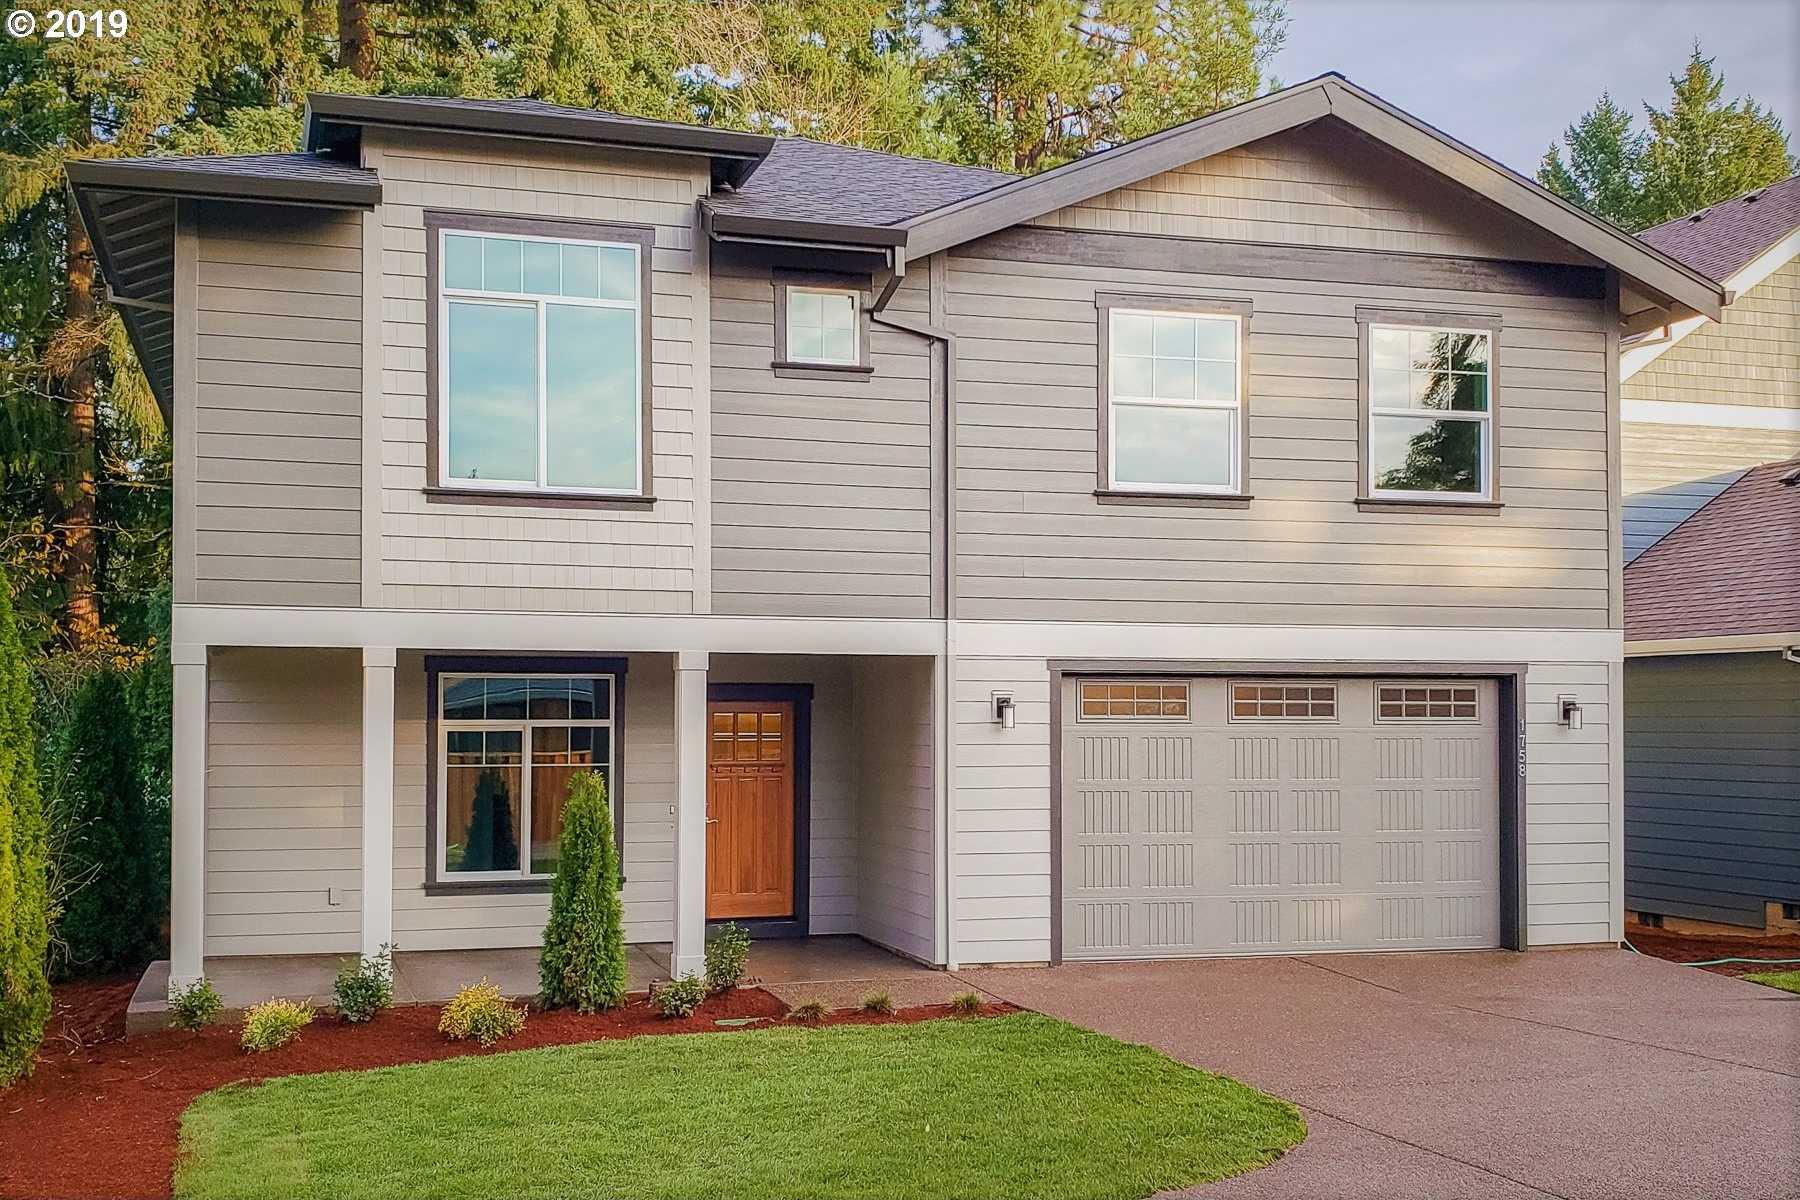 $549,500 - 5Br/3Ba -  for Sale in Beaverton